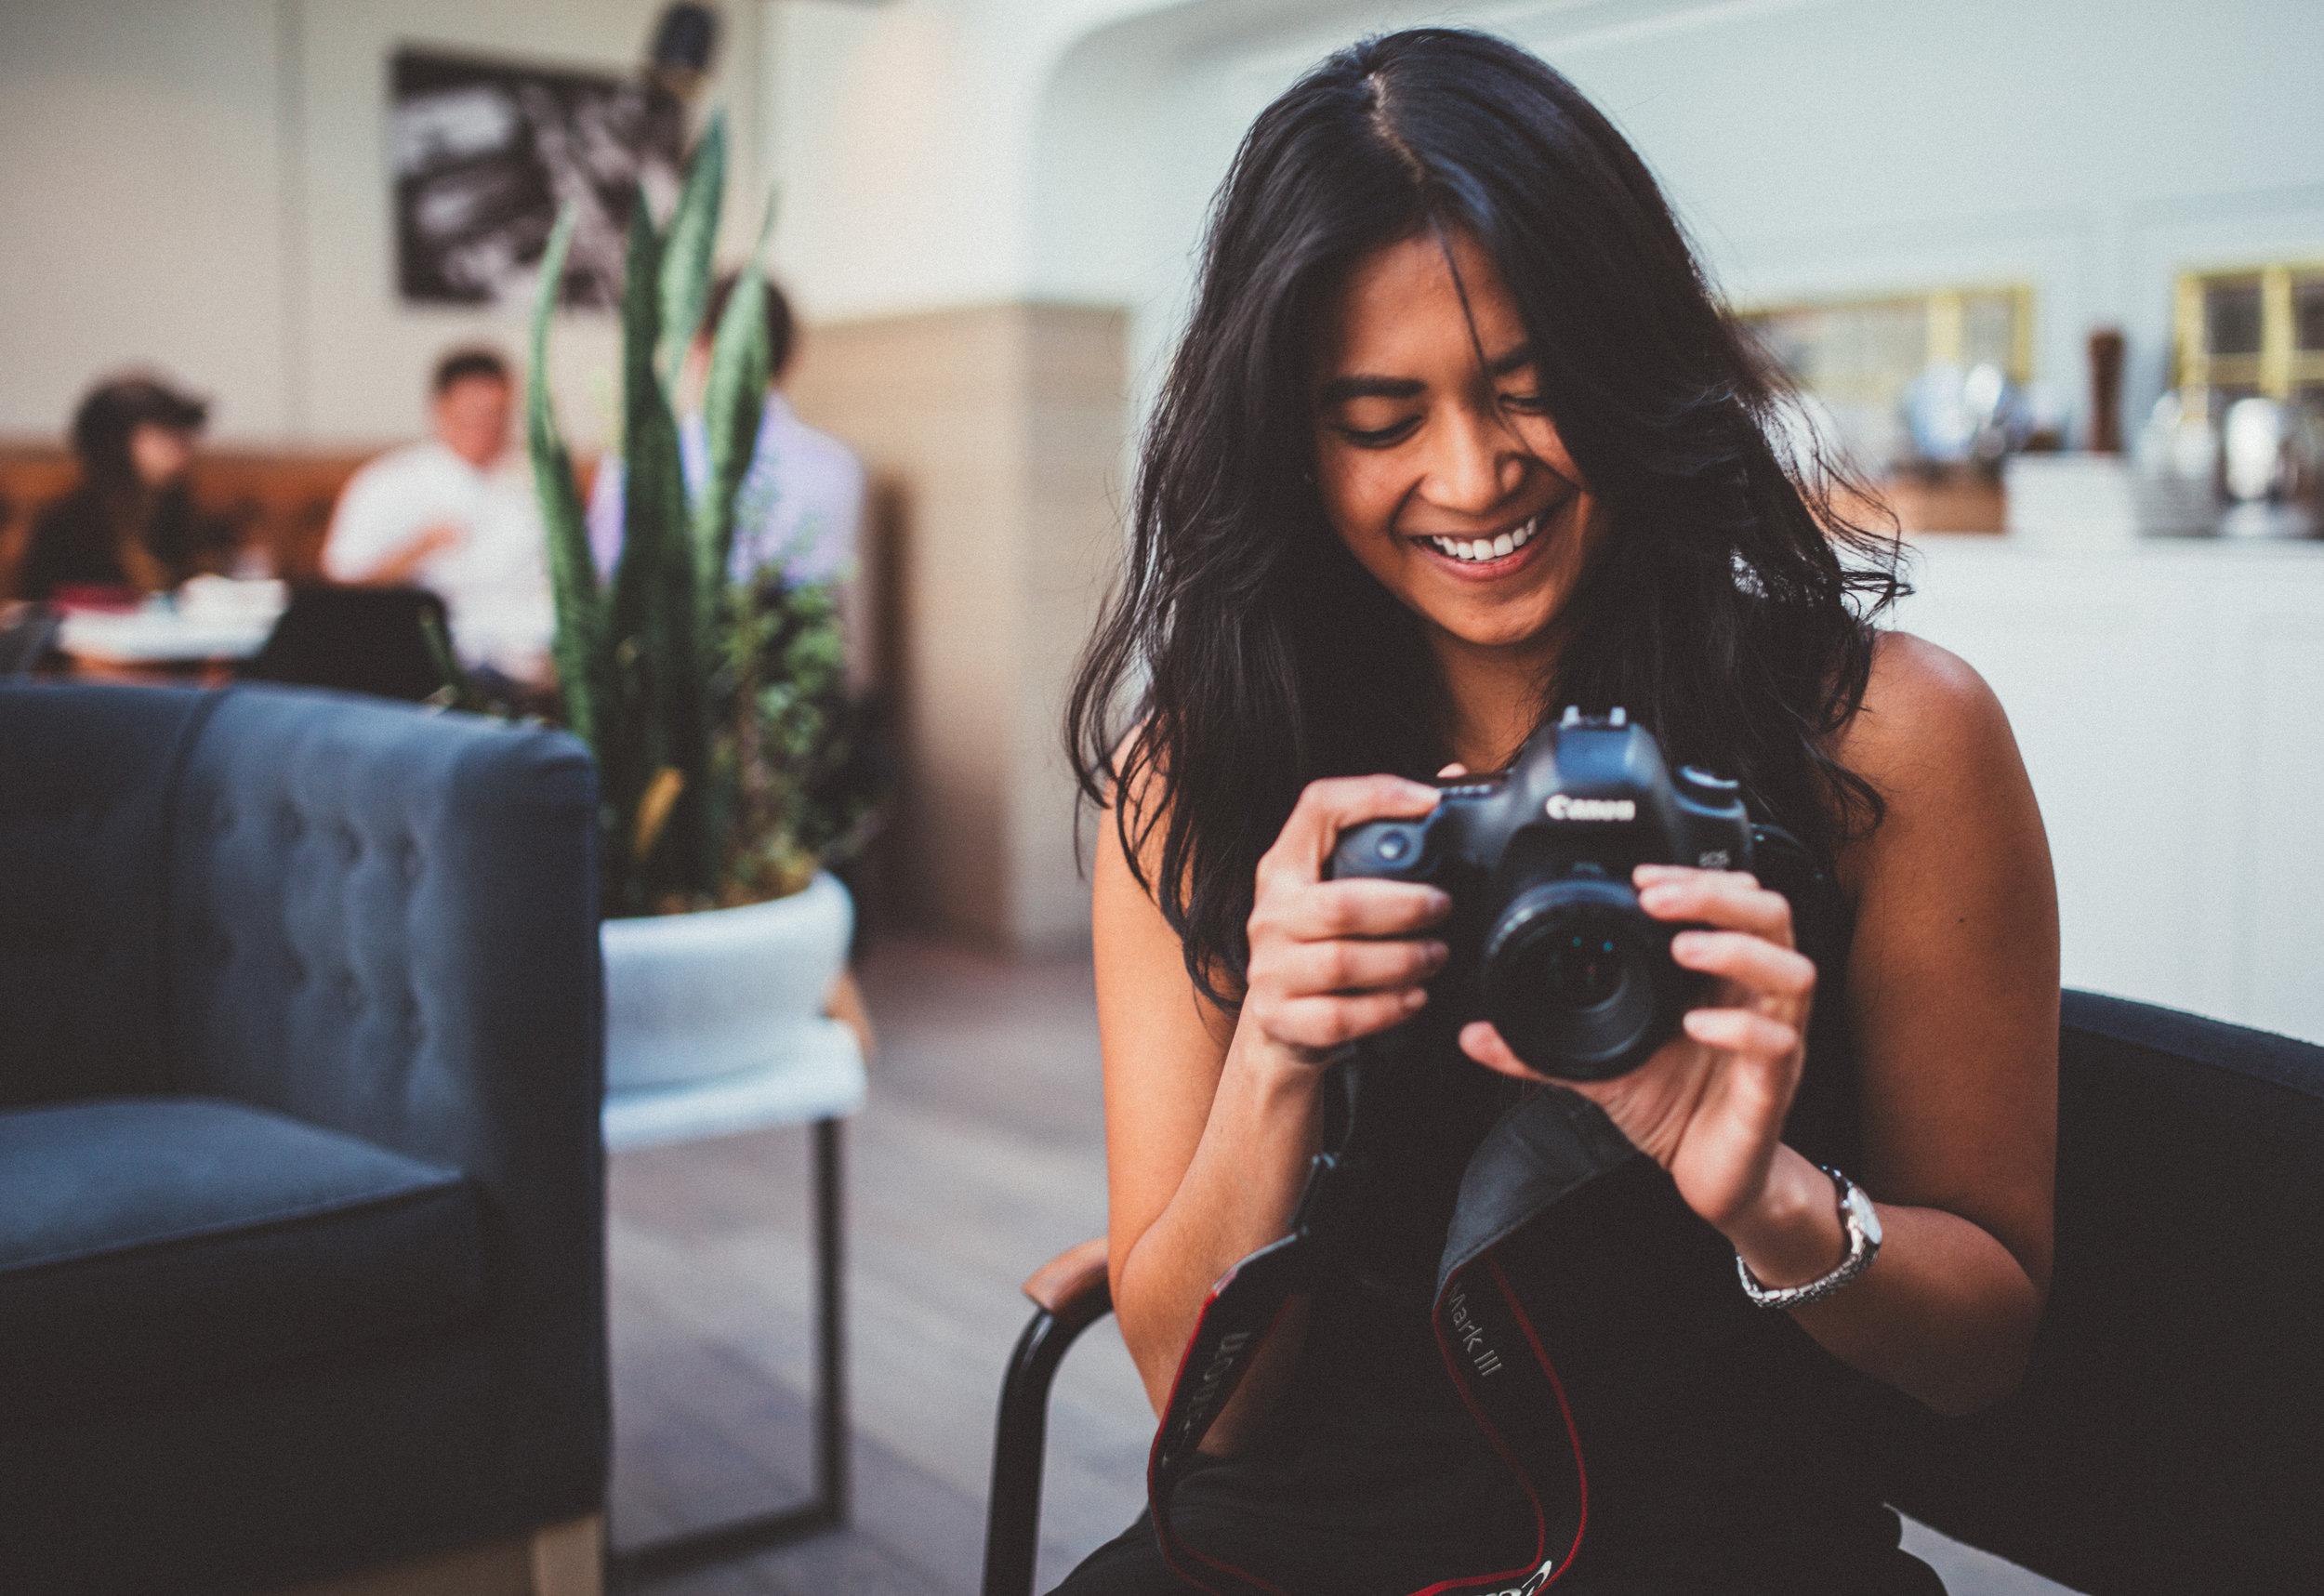 Alexa Fernando - @ajfernandoDigital Media Creative, Documentary & Commercial Photographer